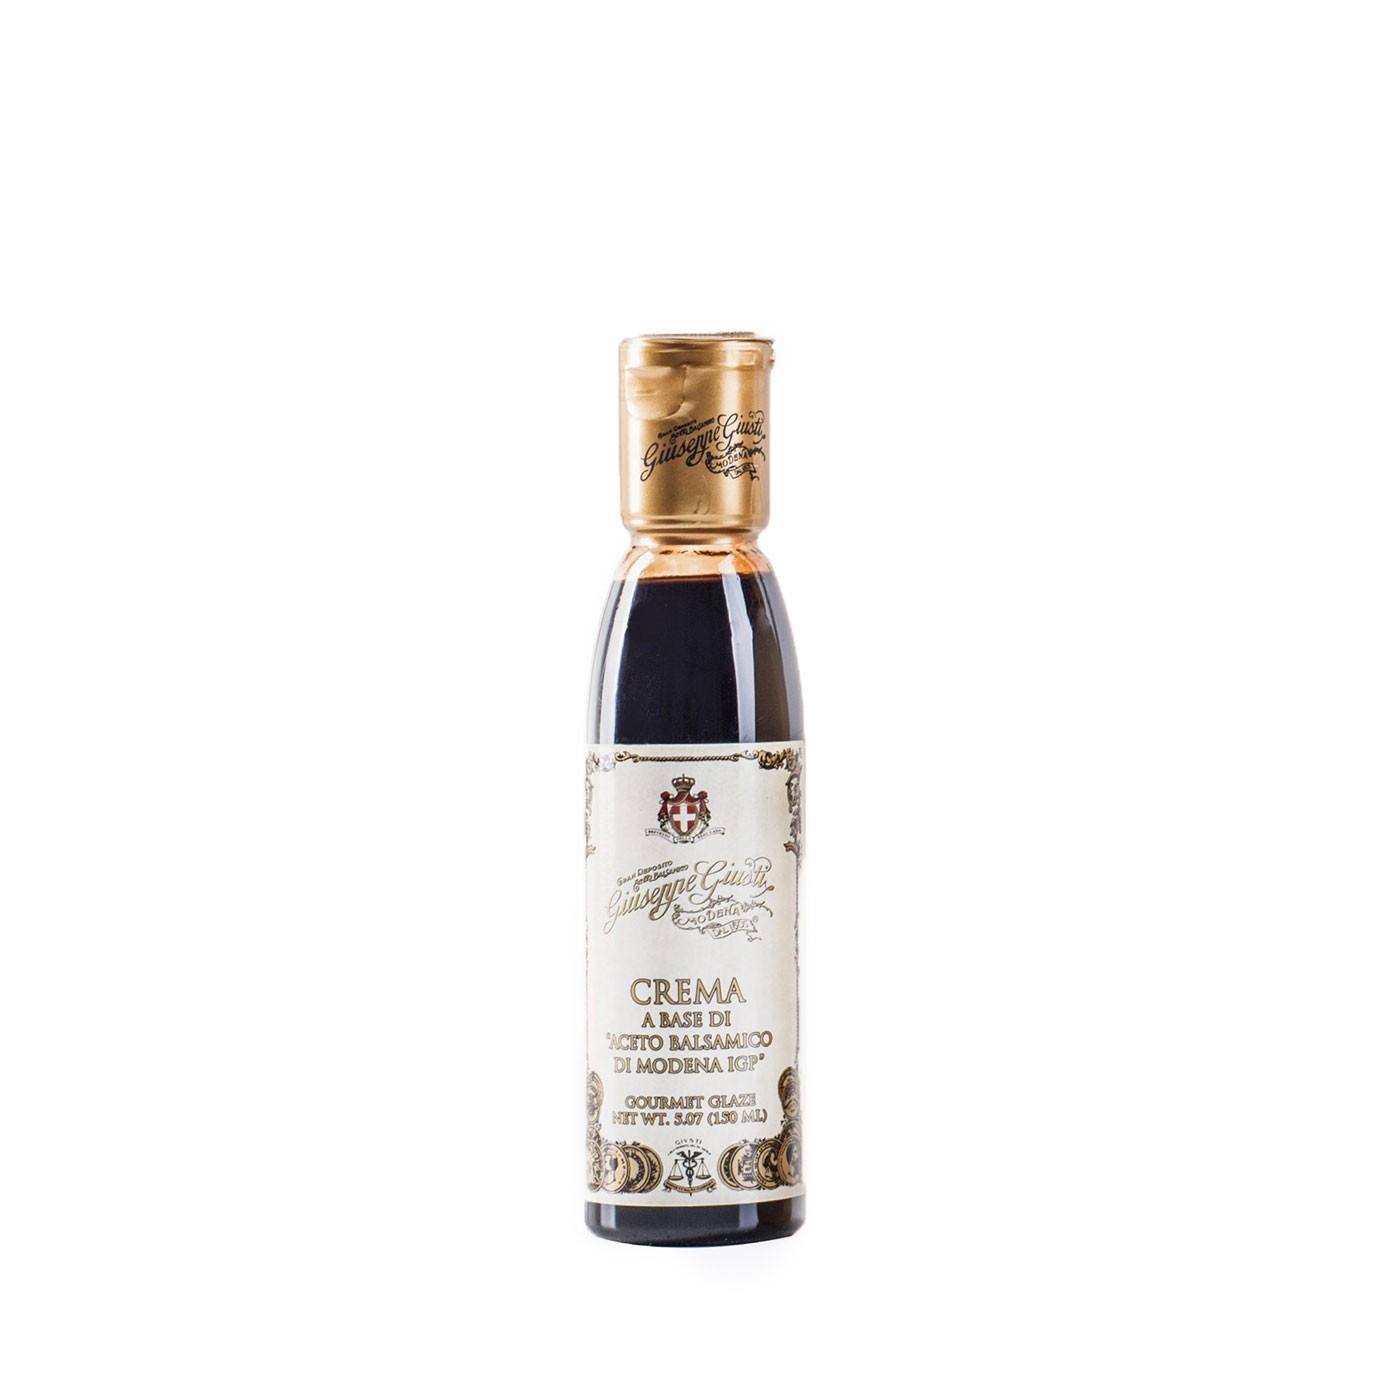 'Crema' Glaze with Balsamic Vinegar of Modena IGP 5 oz